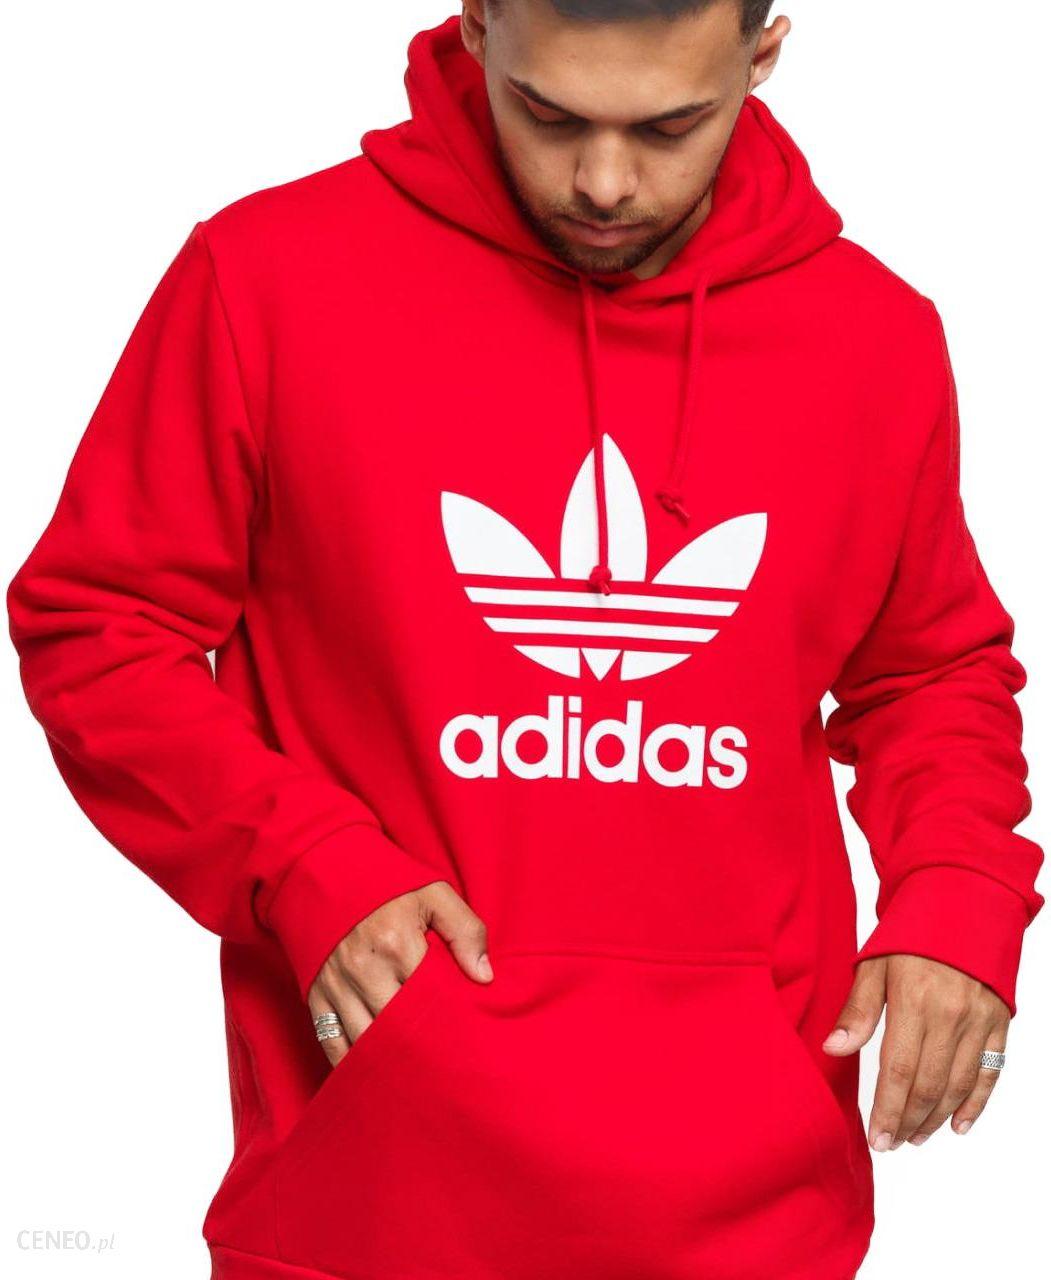 Adidas Originals Camo Bluza Męska Z Kapturem 3XL Ceny i opinie Ceneo.pl